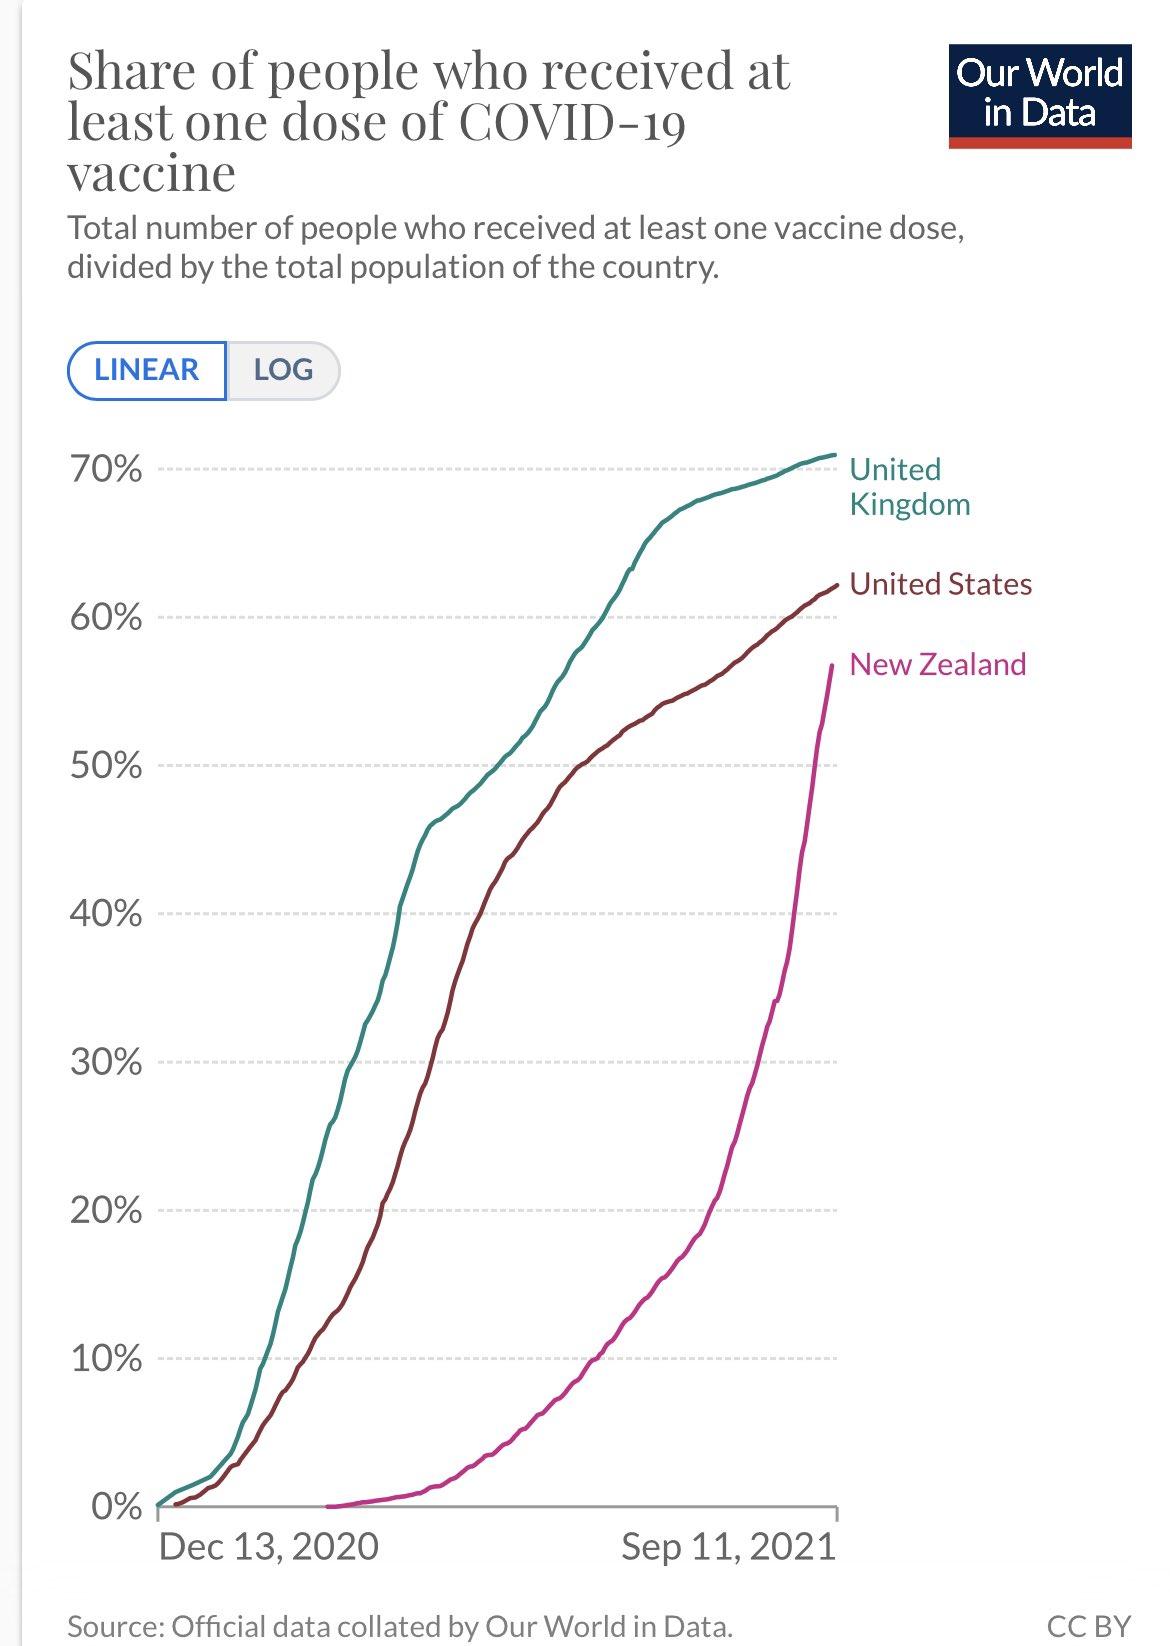 NZ/UK/US 1st dose vax